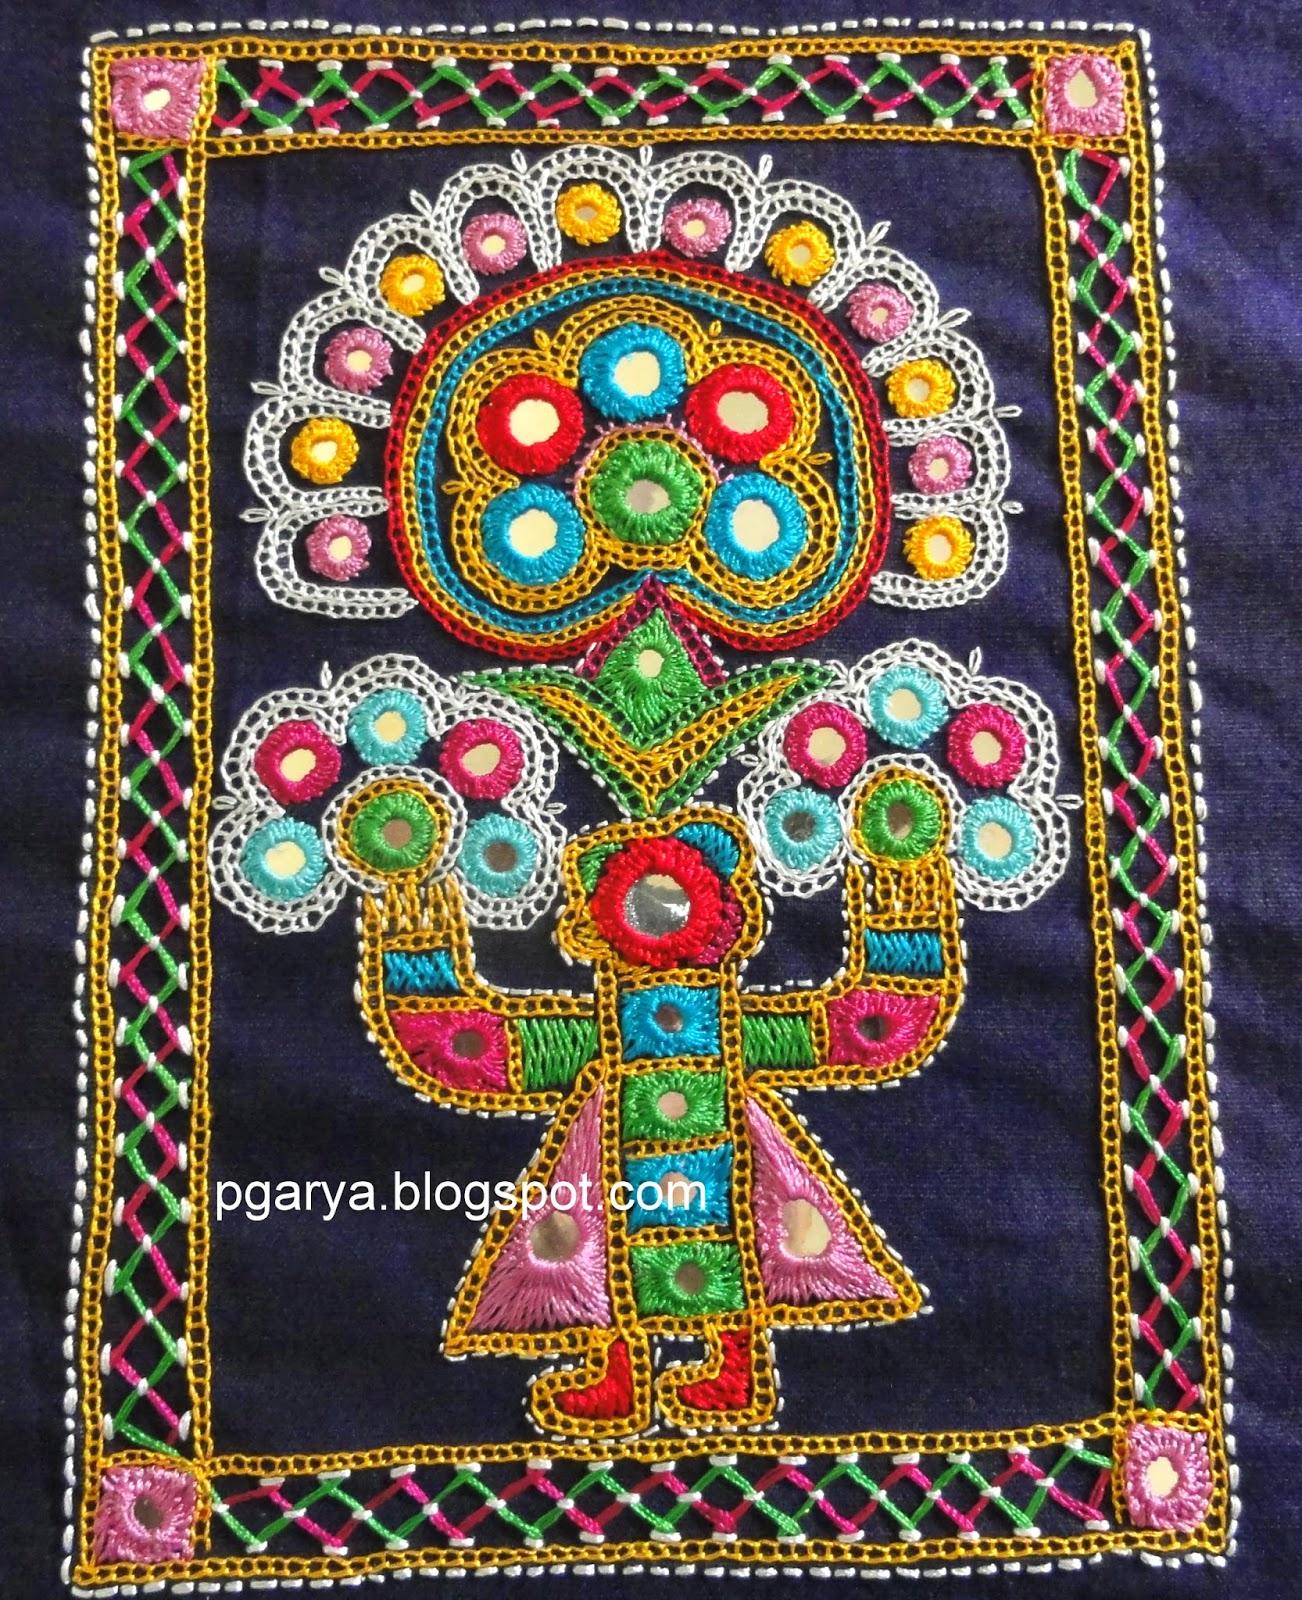 Ahir embroidery of kutch gujarat